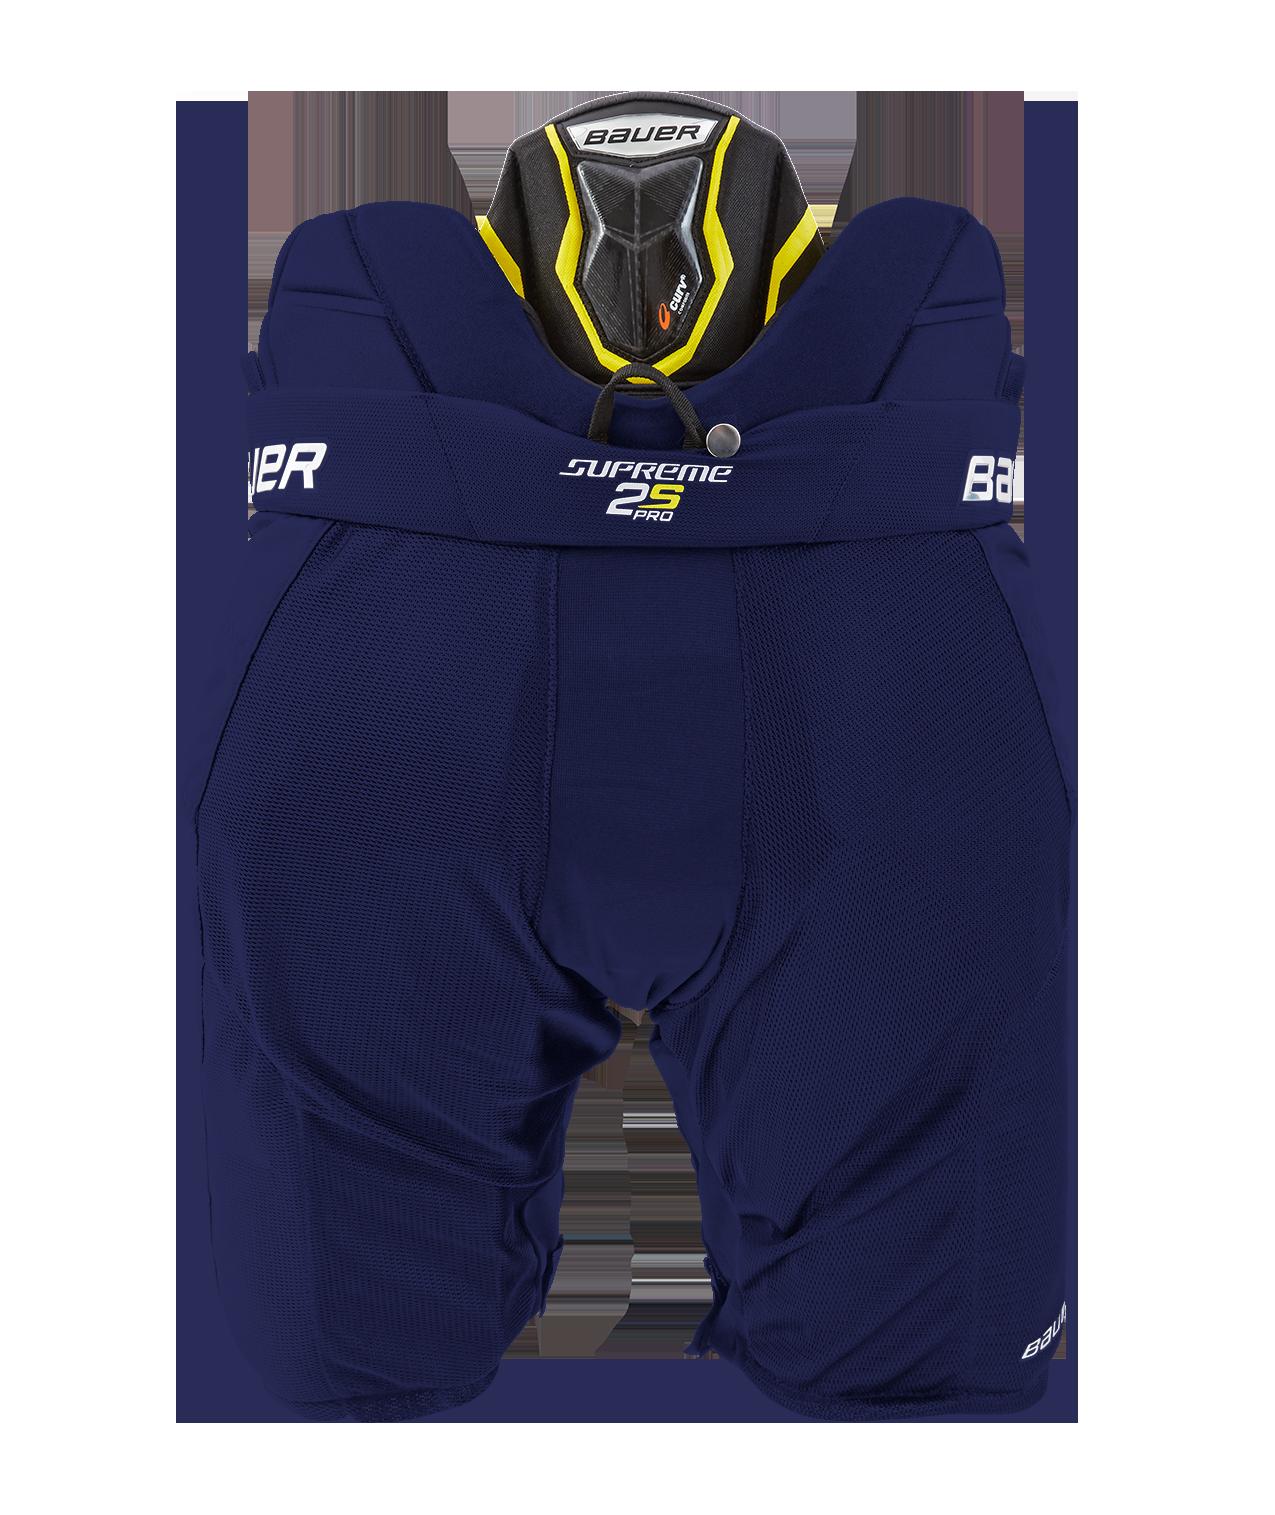 Supreme 2S PRO Pants Senior